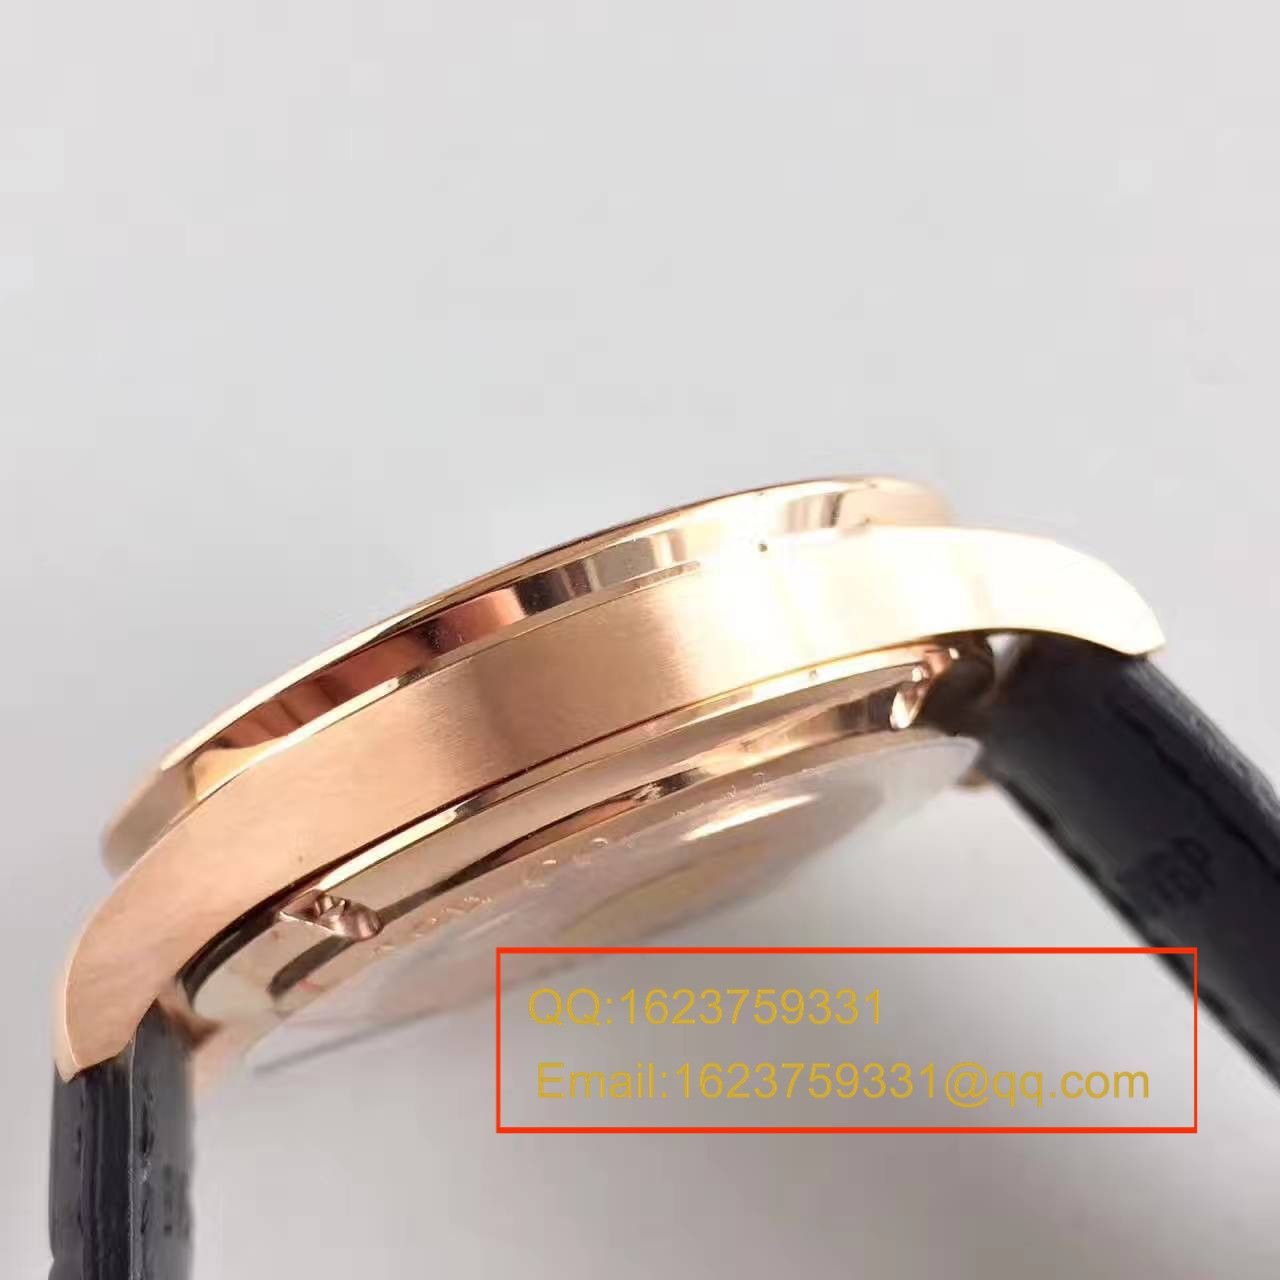 【ZF厂1:1精仿手表】万国葡萄牙葡计超薄升级版IW371482腕表 / WG094